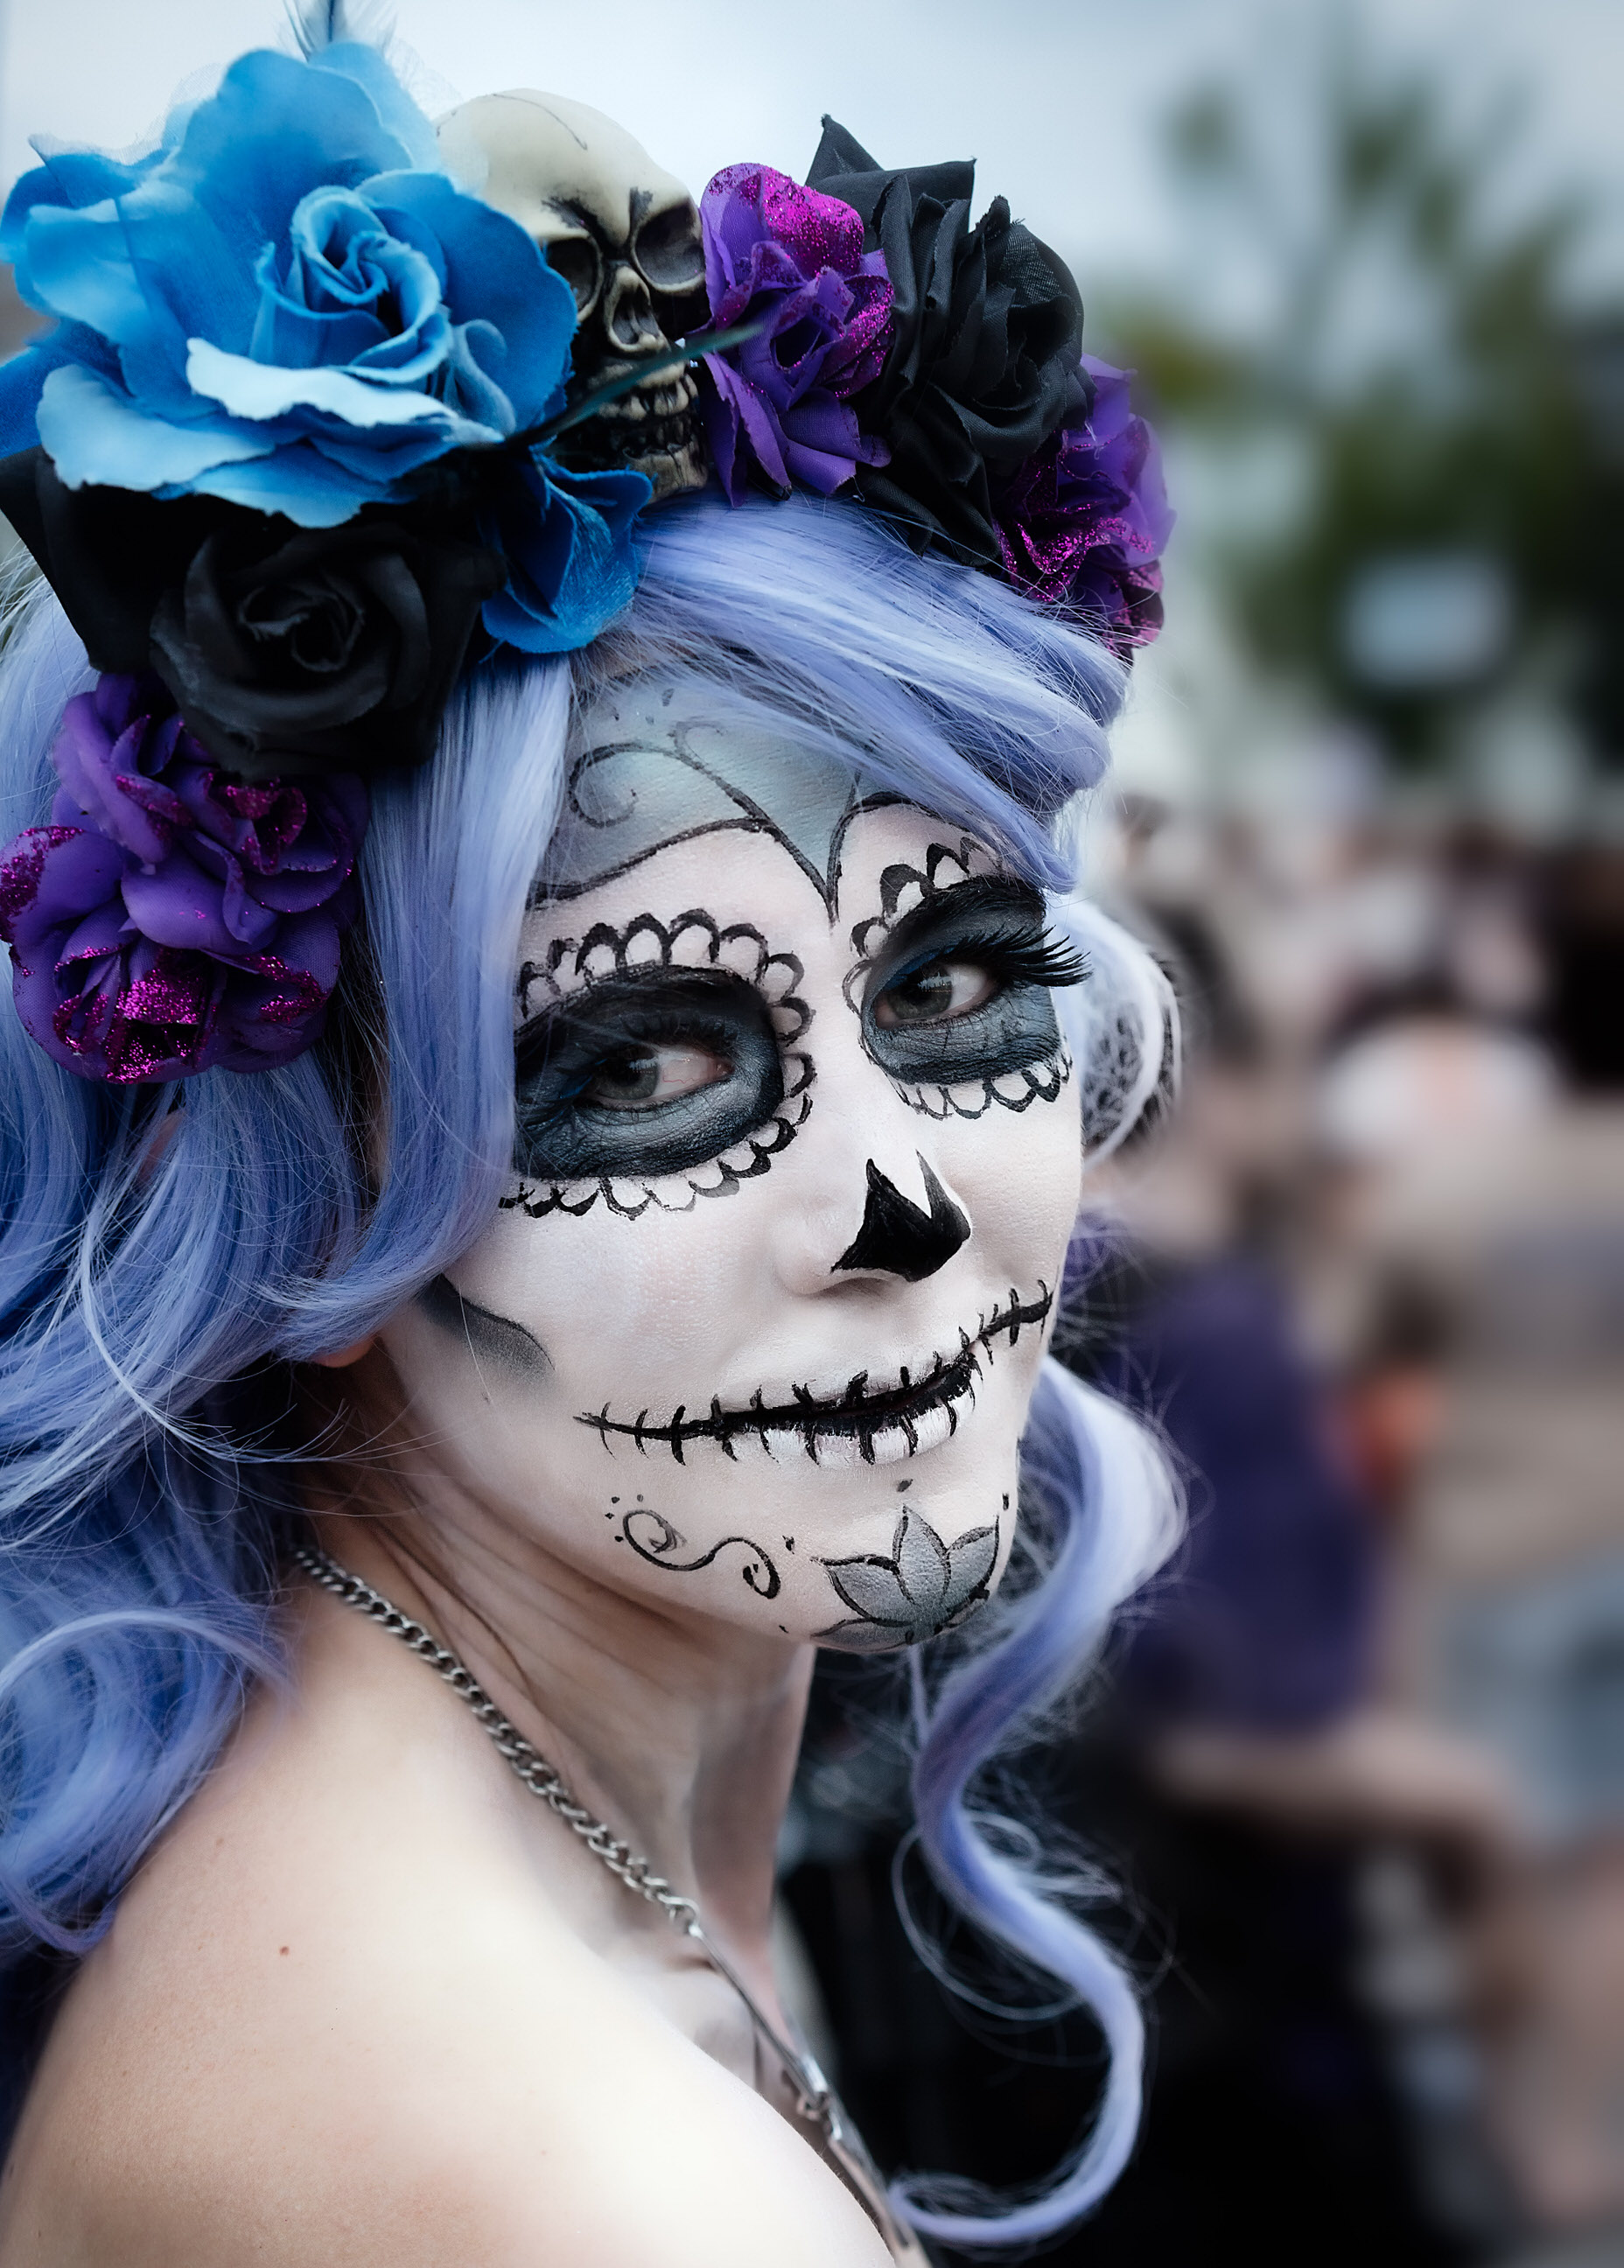 NOLA_Halloween-04070-Edit.jpg